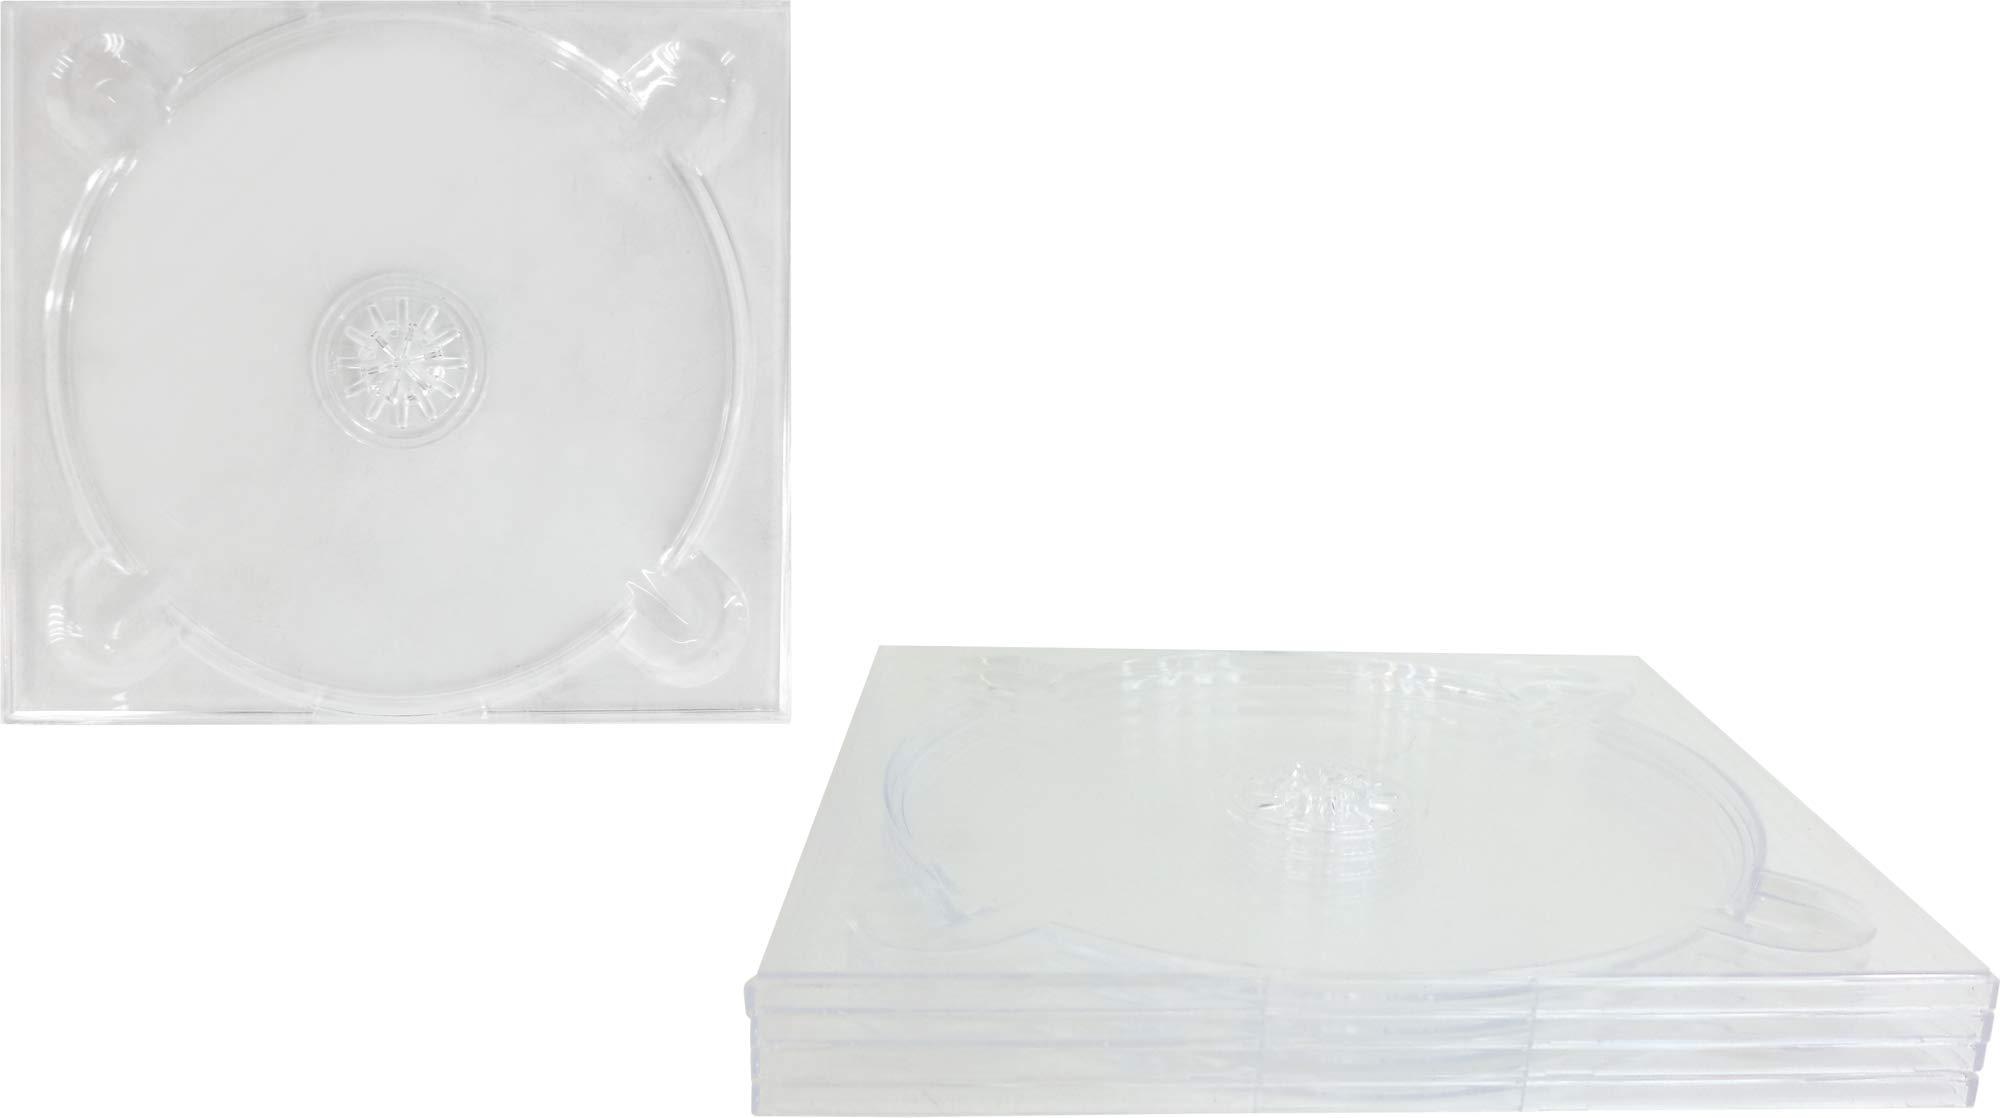 (5) Clear Digipak Glue in CD Digi Trays/Inserts #CDIR70CL